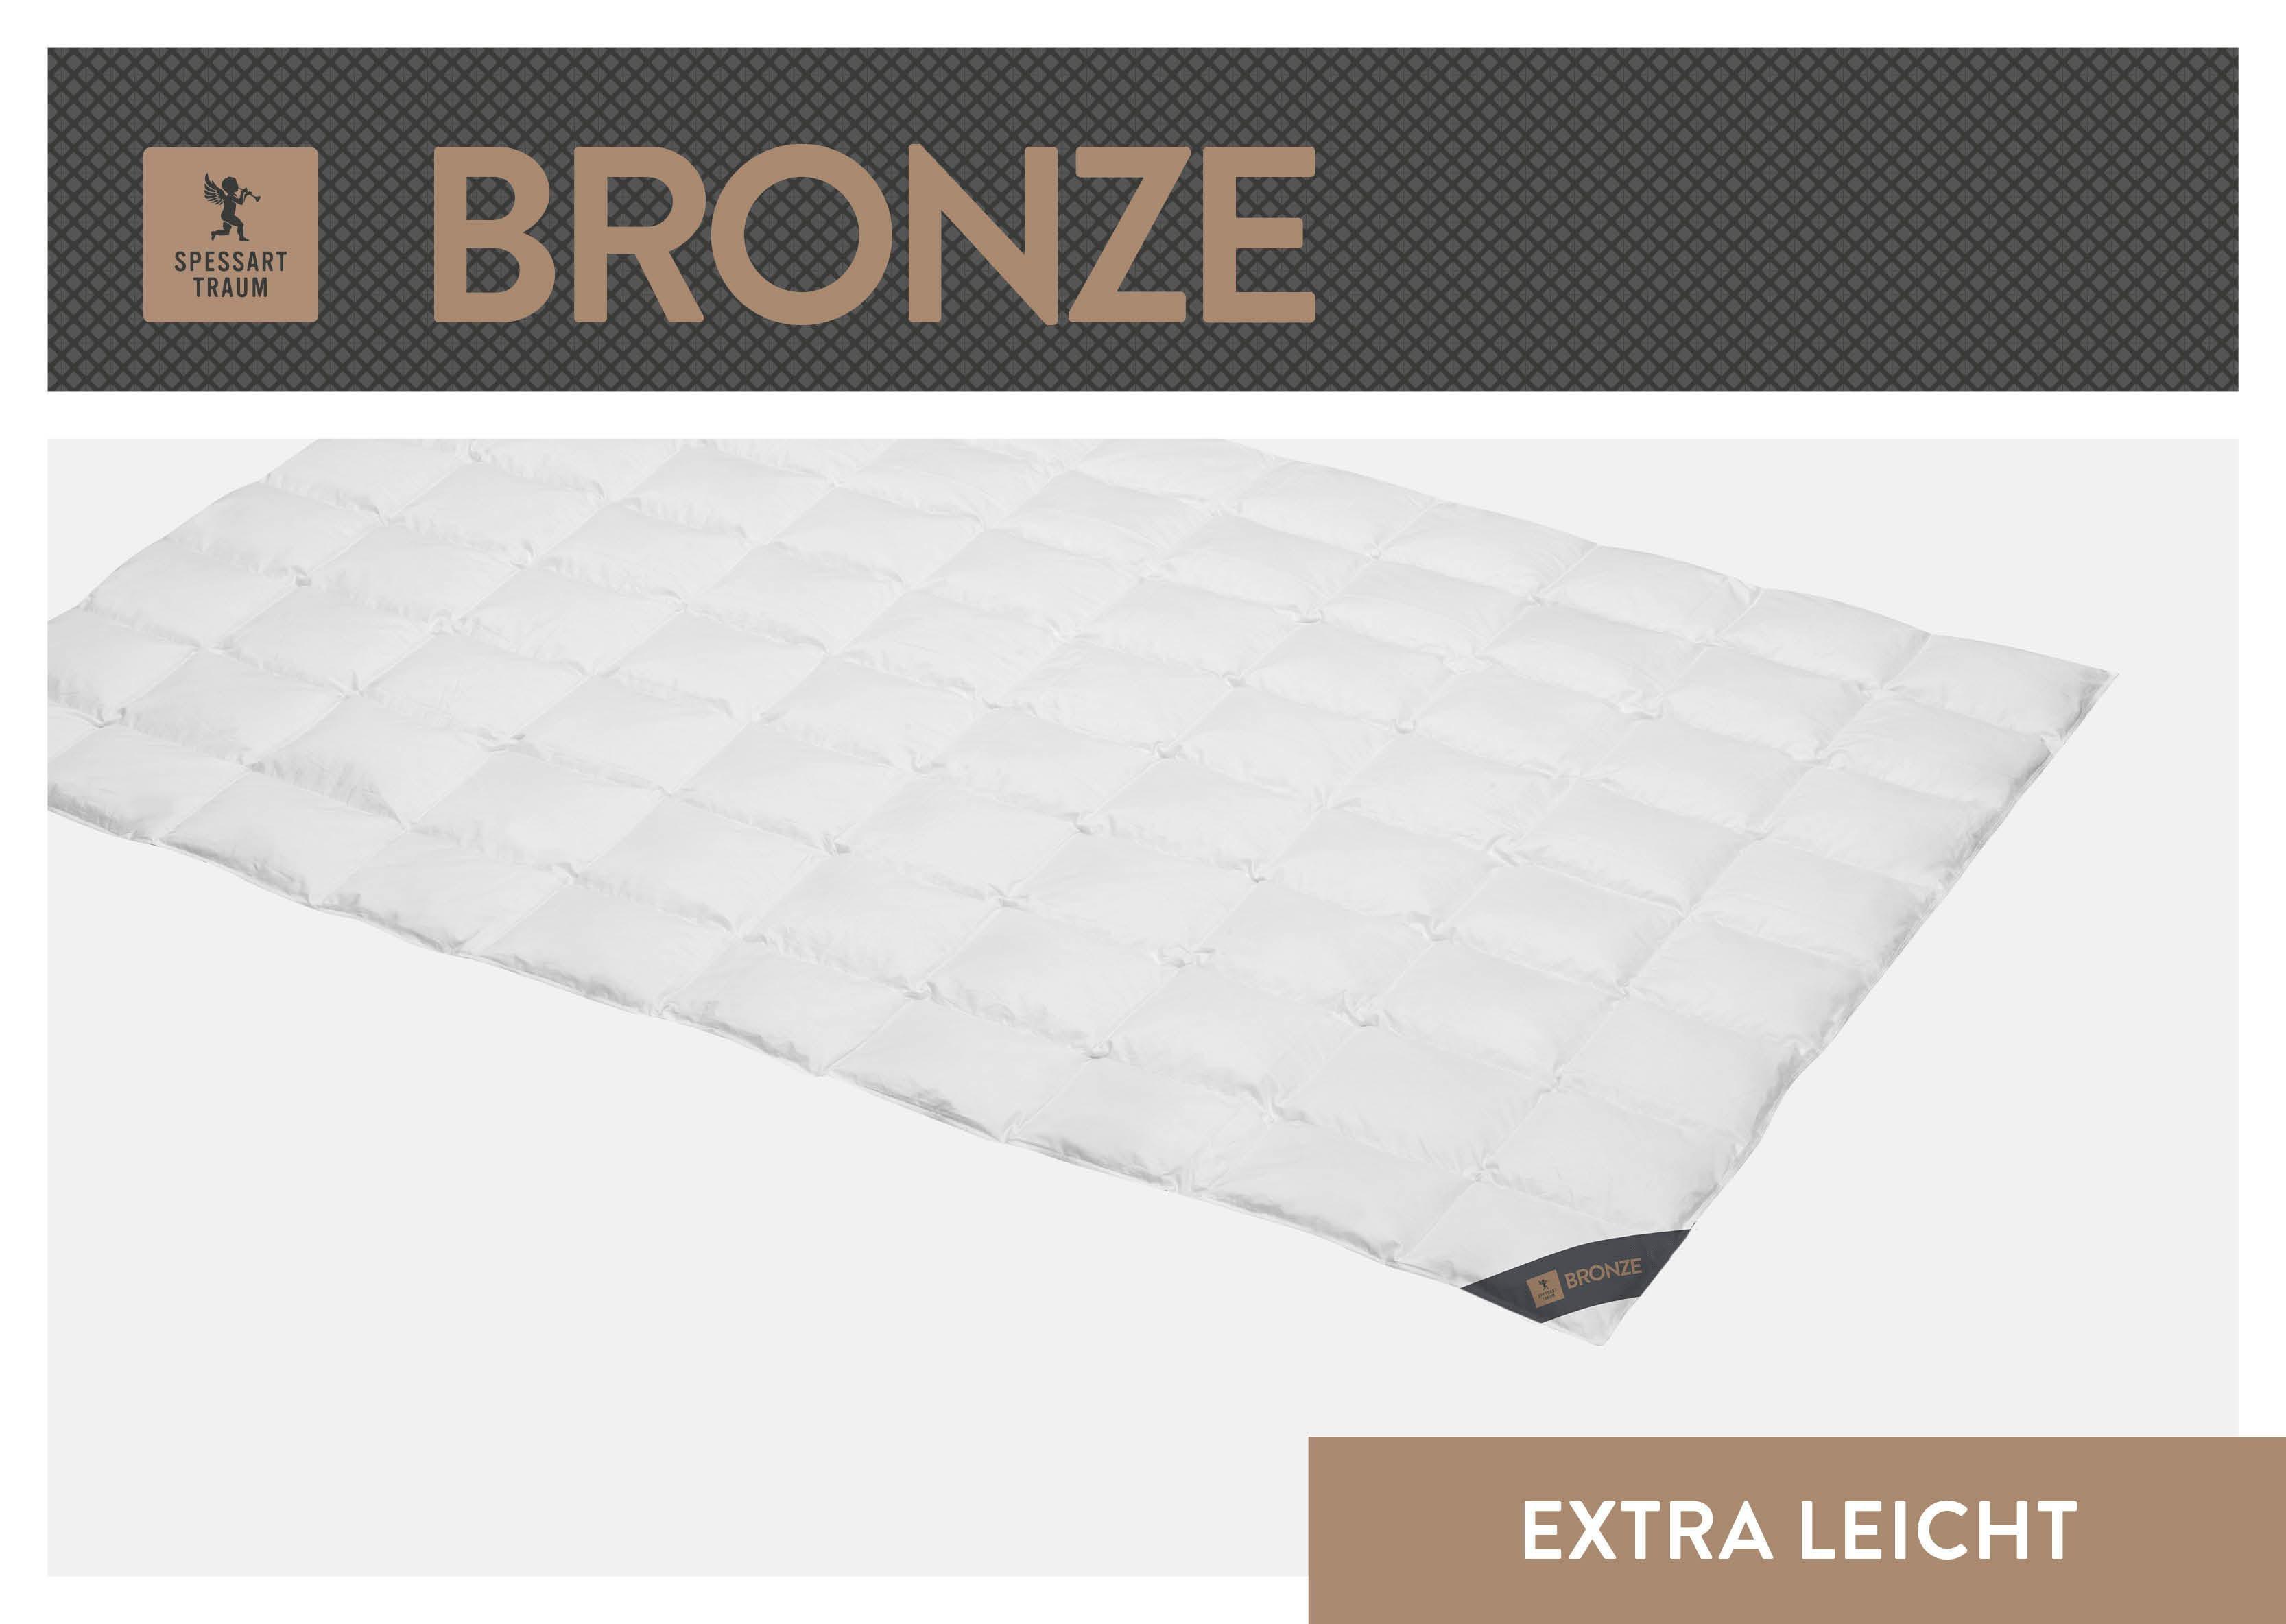 Daunenbettdecke Bronze SPESSARTTRAUM extraleicht Füllung: 90% Daunen 10% Federn Bezug: 100% Baumwolle